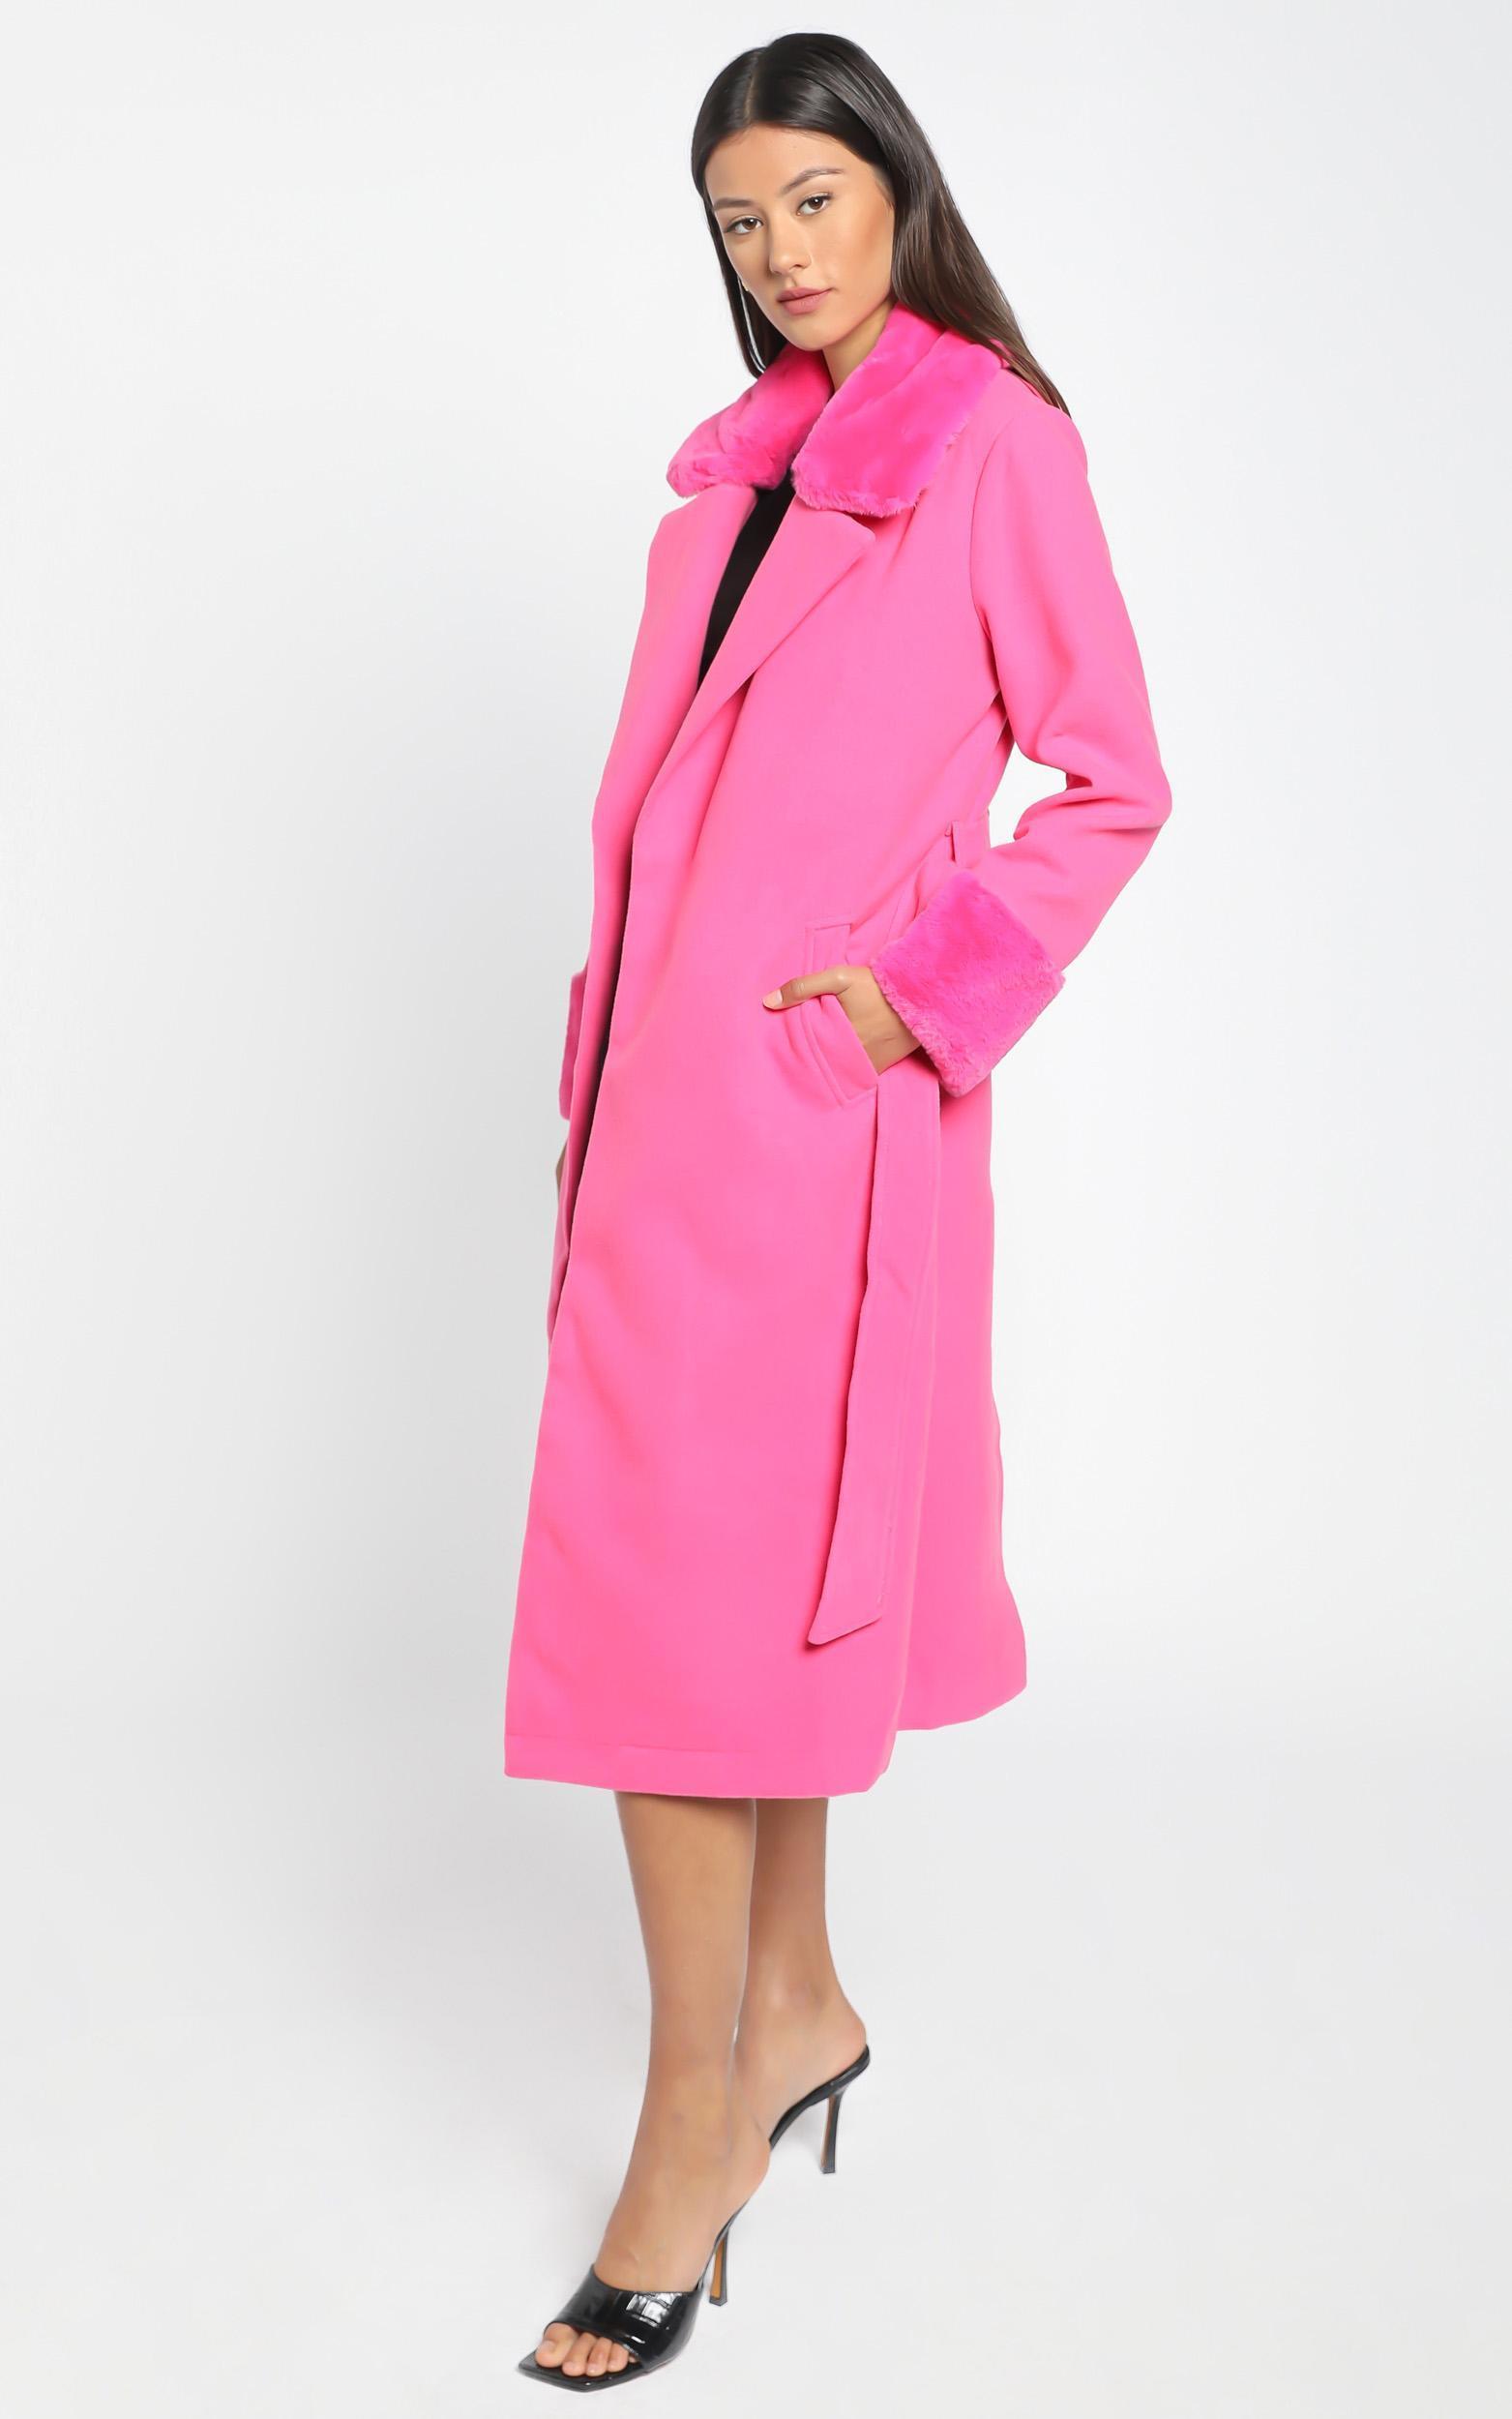 Manhattan Mornings Coat in hot pink - 14 (XL), Pink, hi-res image number null